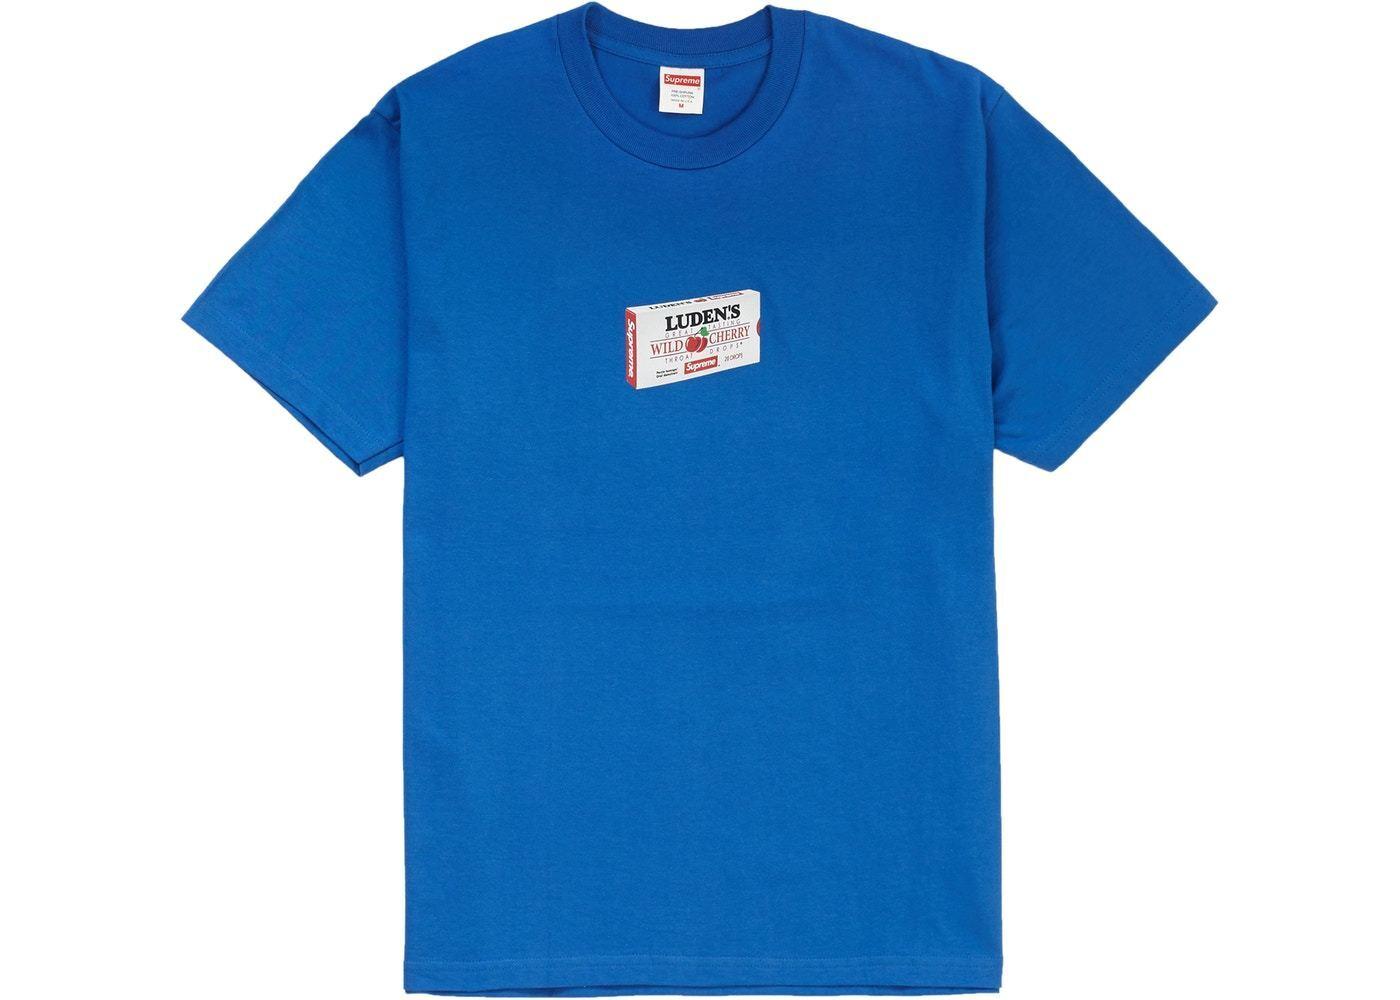 SUPREME X LUDEN'S T-SHIRT ROYAL Blau Größe MEDIUM TEE T-SHIRT LUDENS